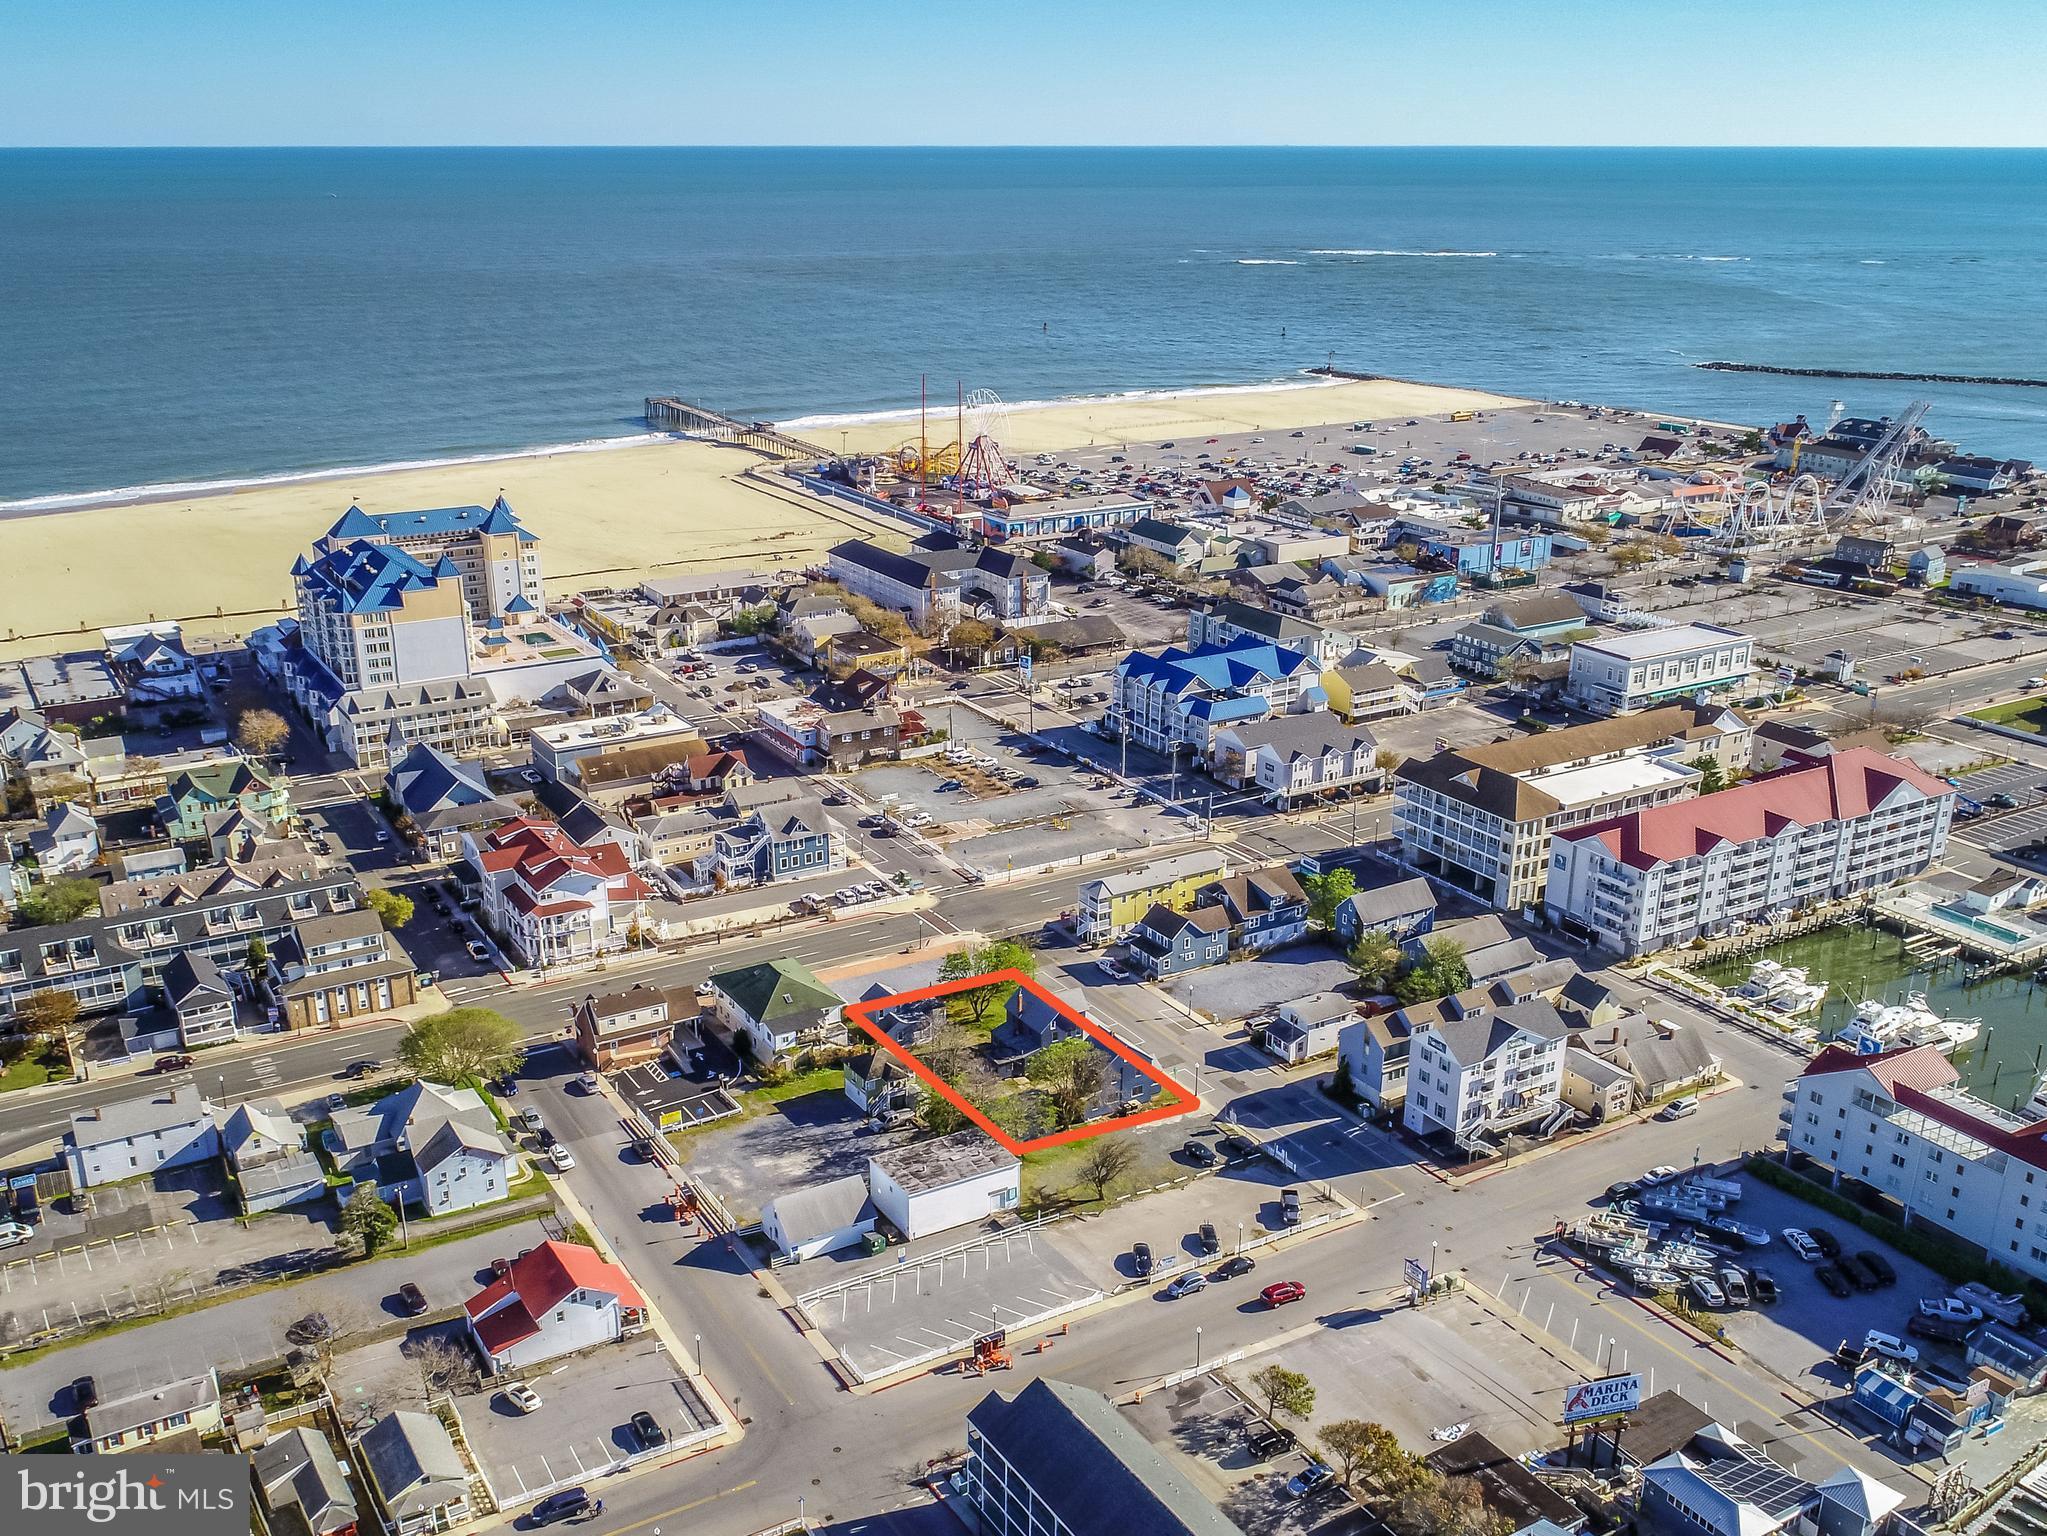 206 204 202 DORCHESTER STREET 202-204-206, OCEAN CITY, MD 21842